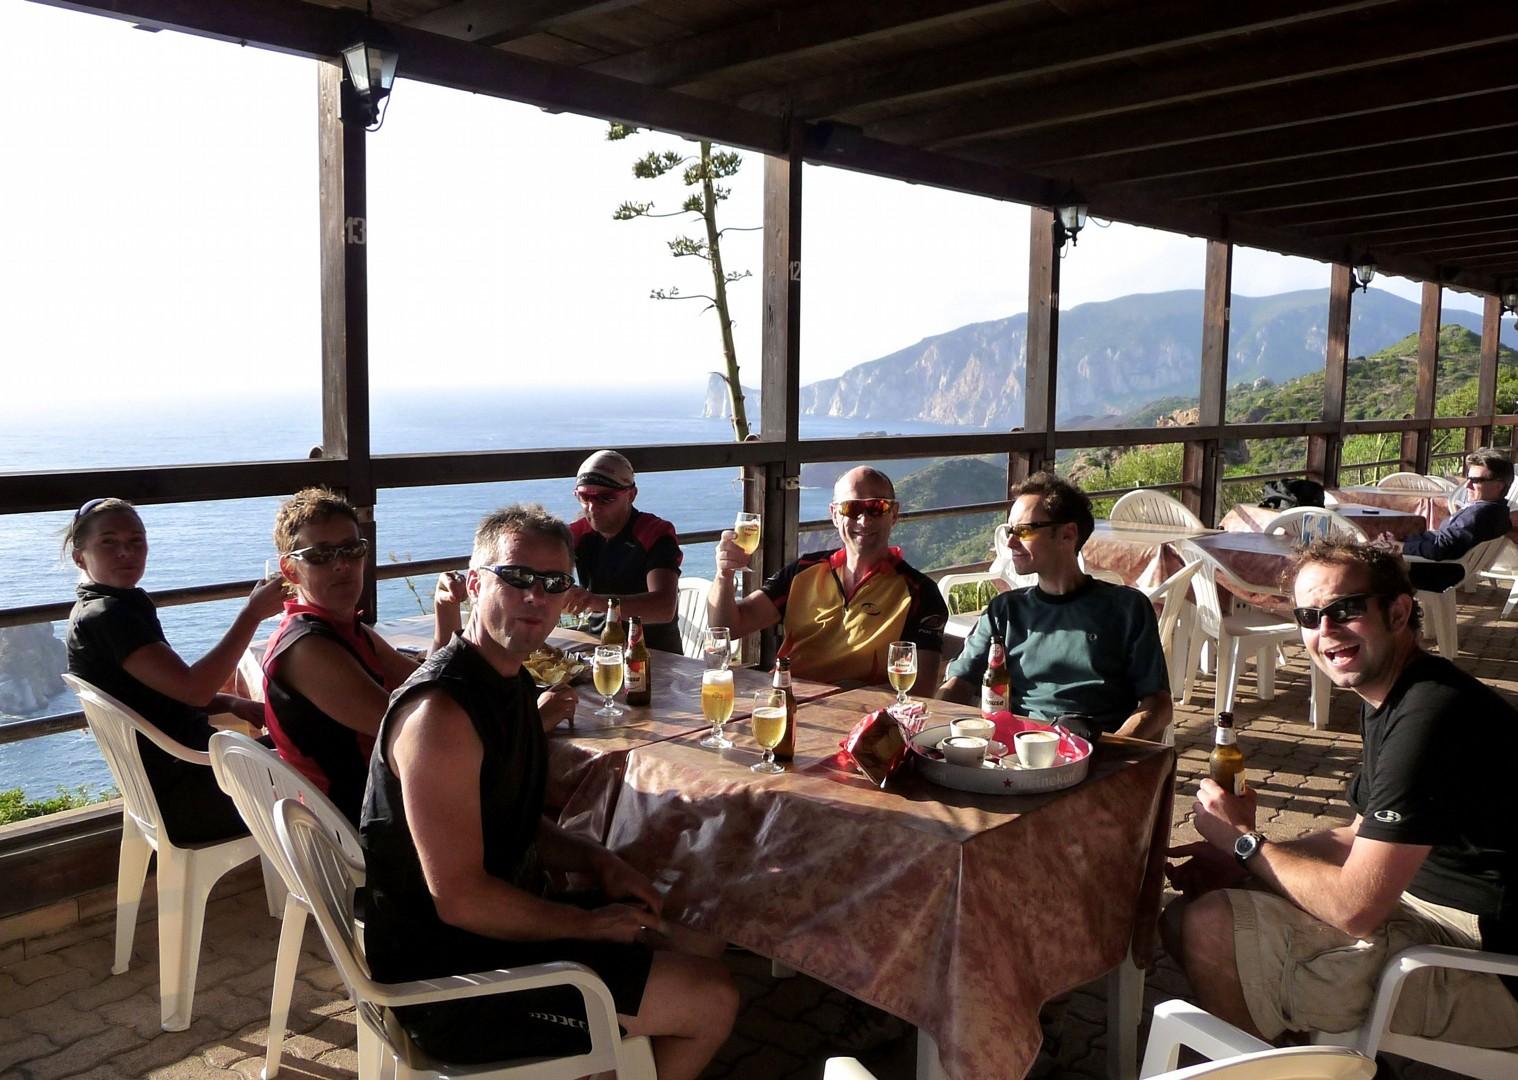 4114696046_b7ee1000f6_o.jpg - Sardinia - La Costa Verde - Guided Mountain Bike Holiday - Italia Mountain Biking